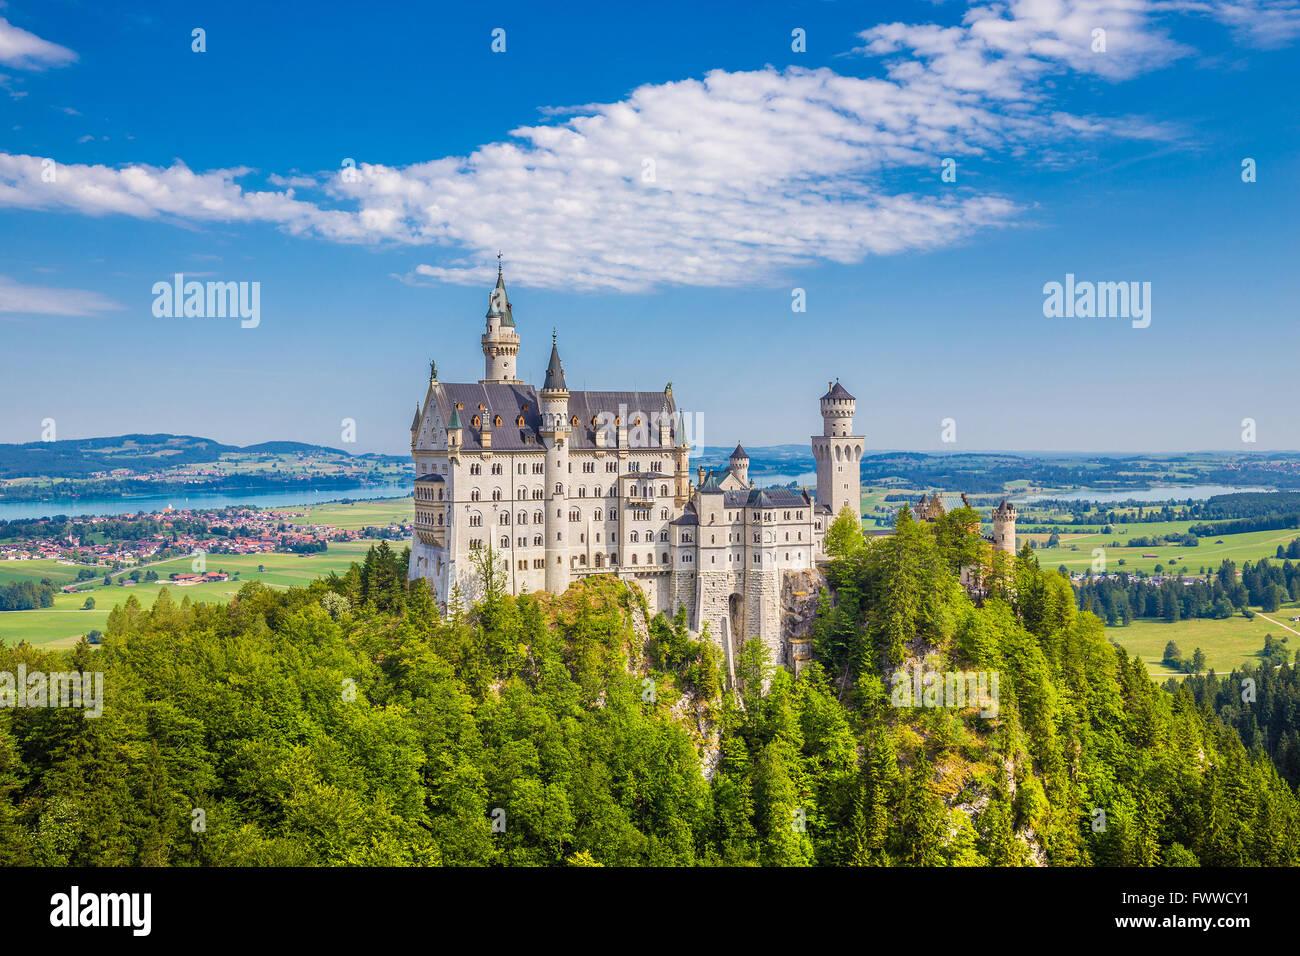 Vista clásica del famoso castillo de Neuschwanstein, Baviera, Alemania Imagen De Stock